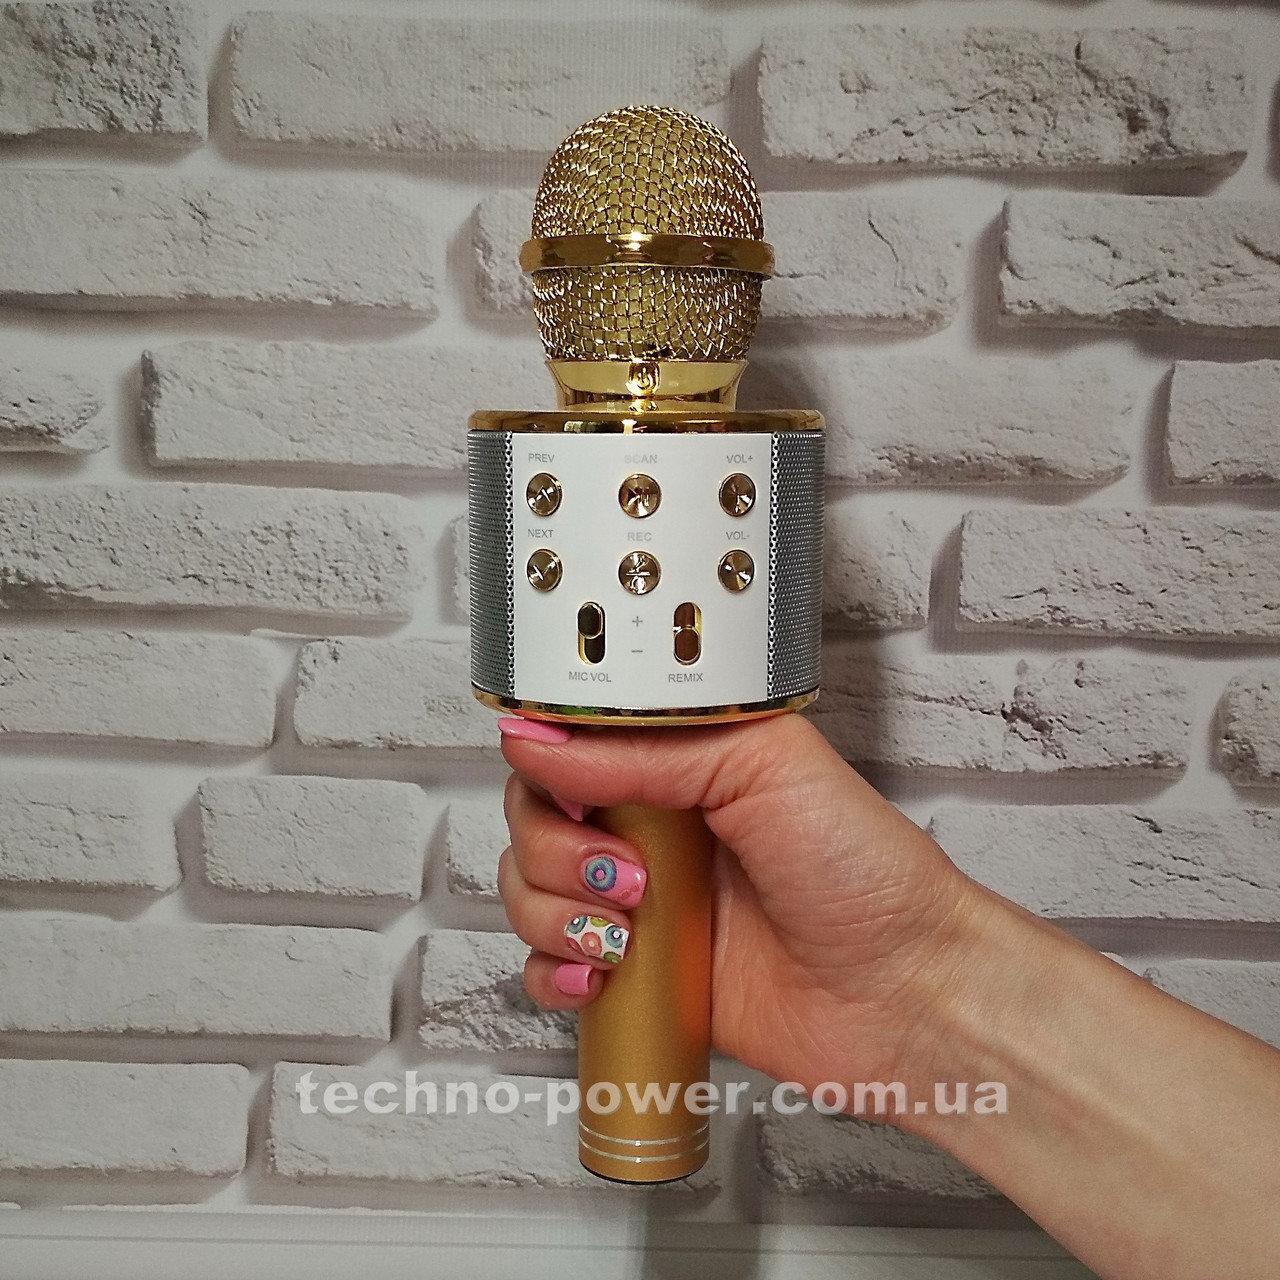 Караоке-мікрофон bluetooth WS858 Золото. Портативний блютуз караоке мікрофон